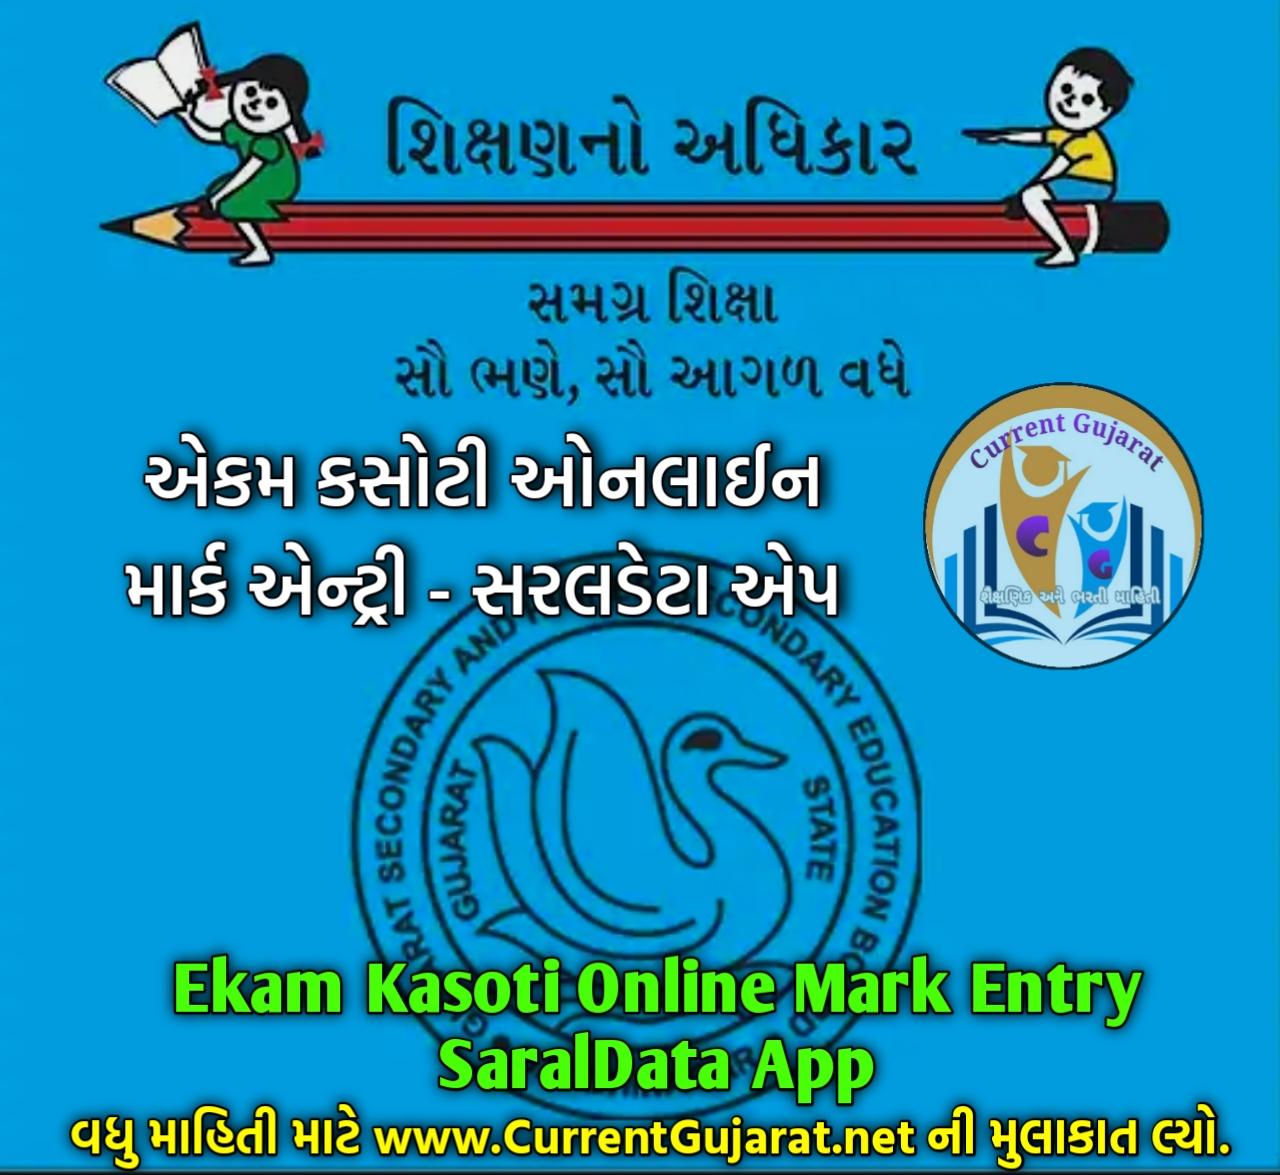 Ekam Kasoti Online Entry SaralData App